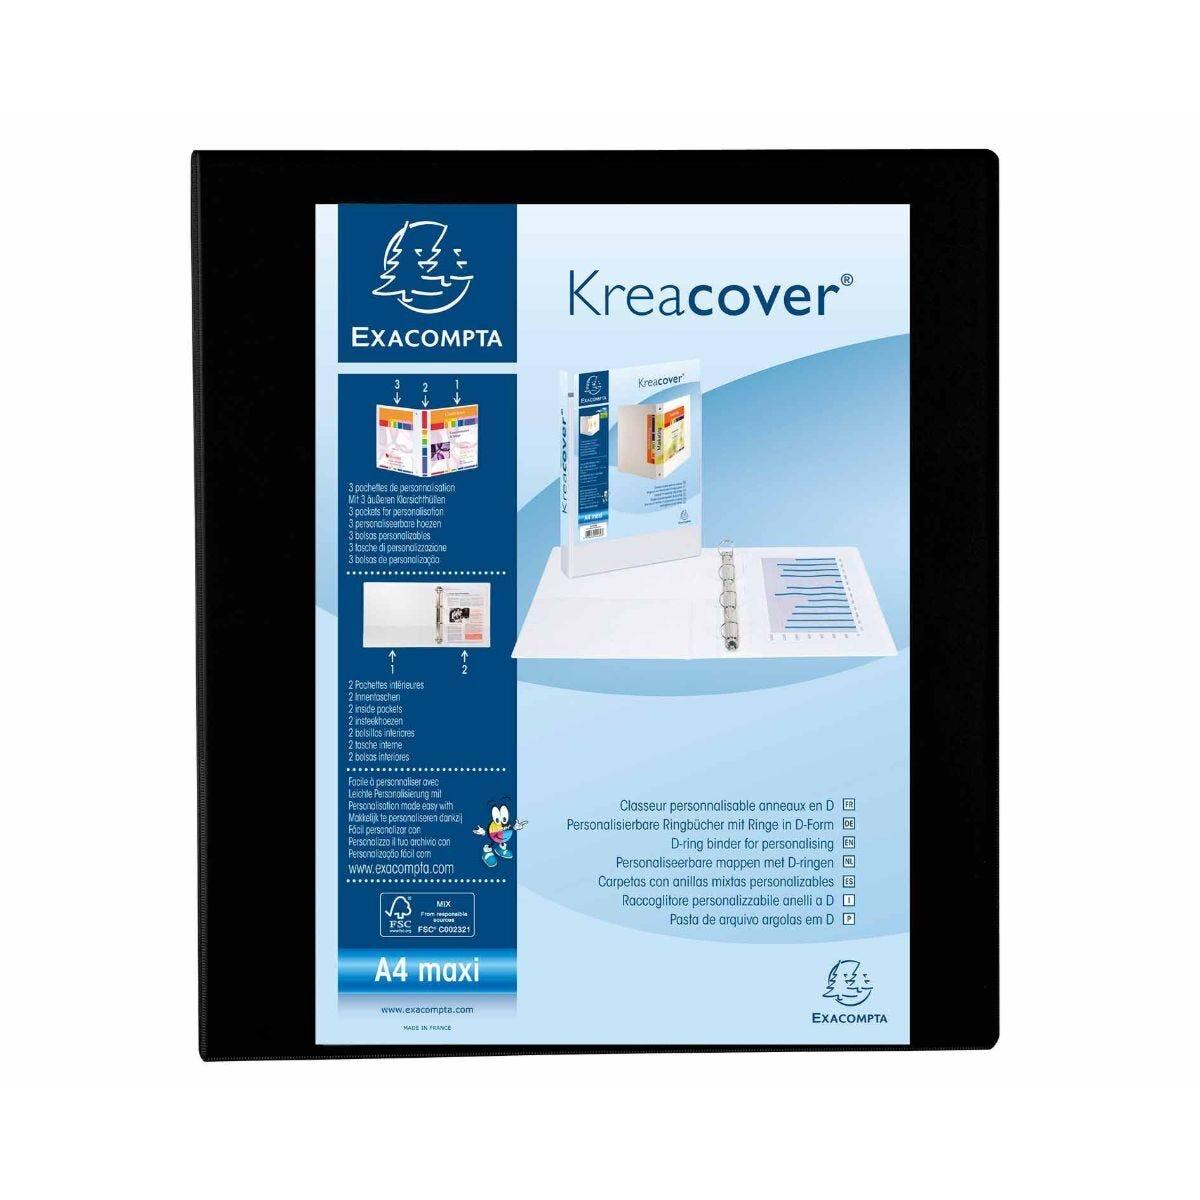 Exacompta Kreacover Ring Binder 4 D Rings 40mm A4 Plus Pack of 10 Black